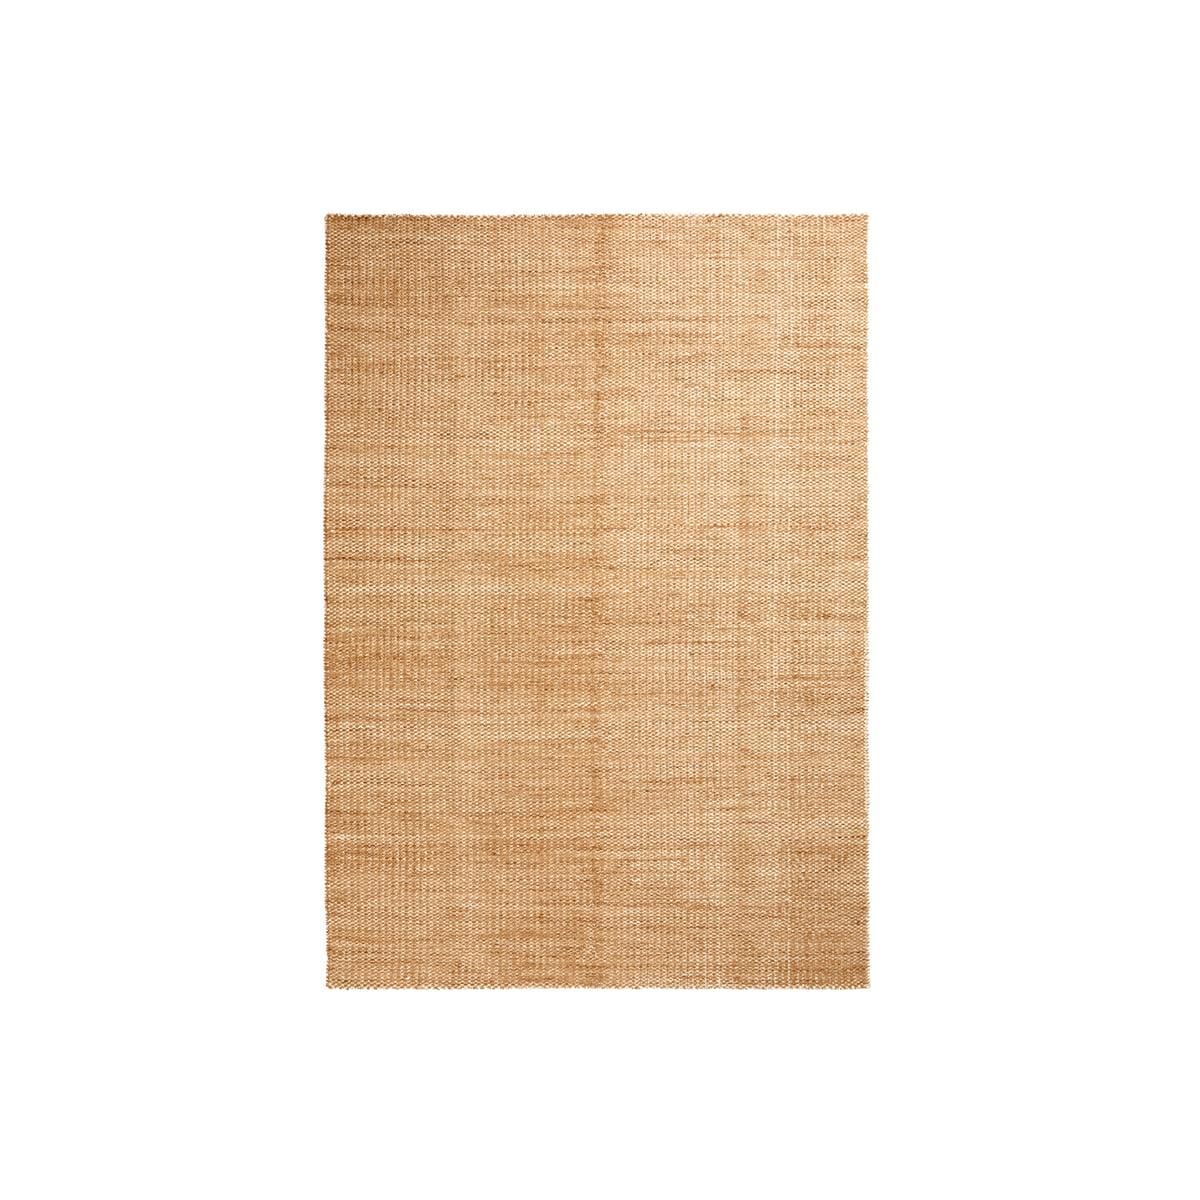 Hay moire kelim teppich 140 x 200 cm gelb